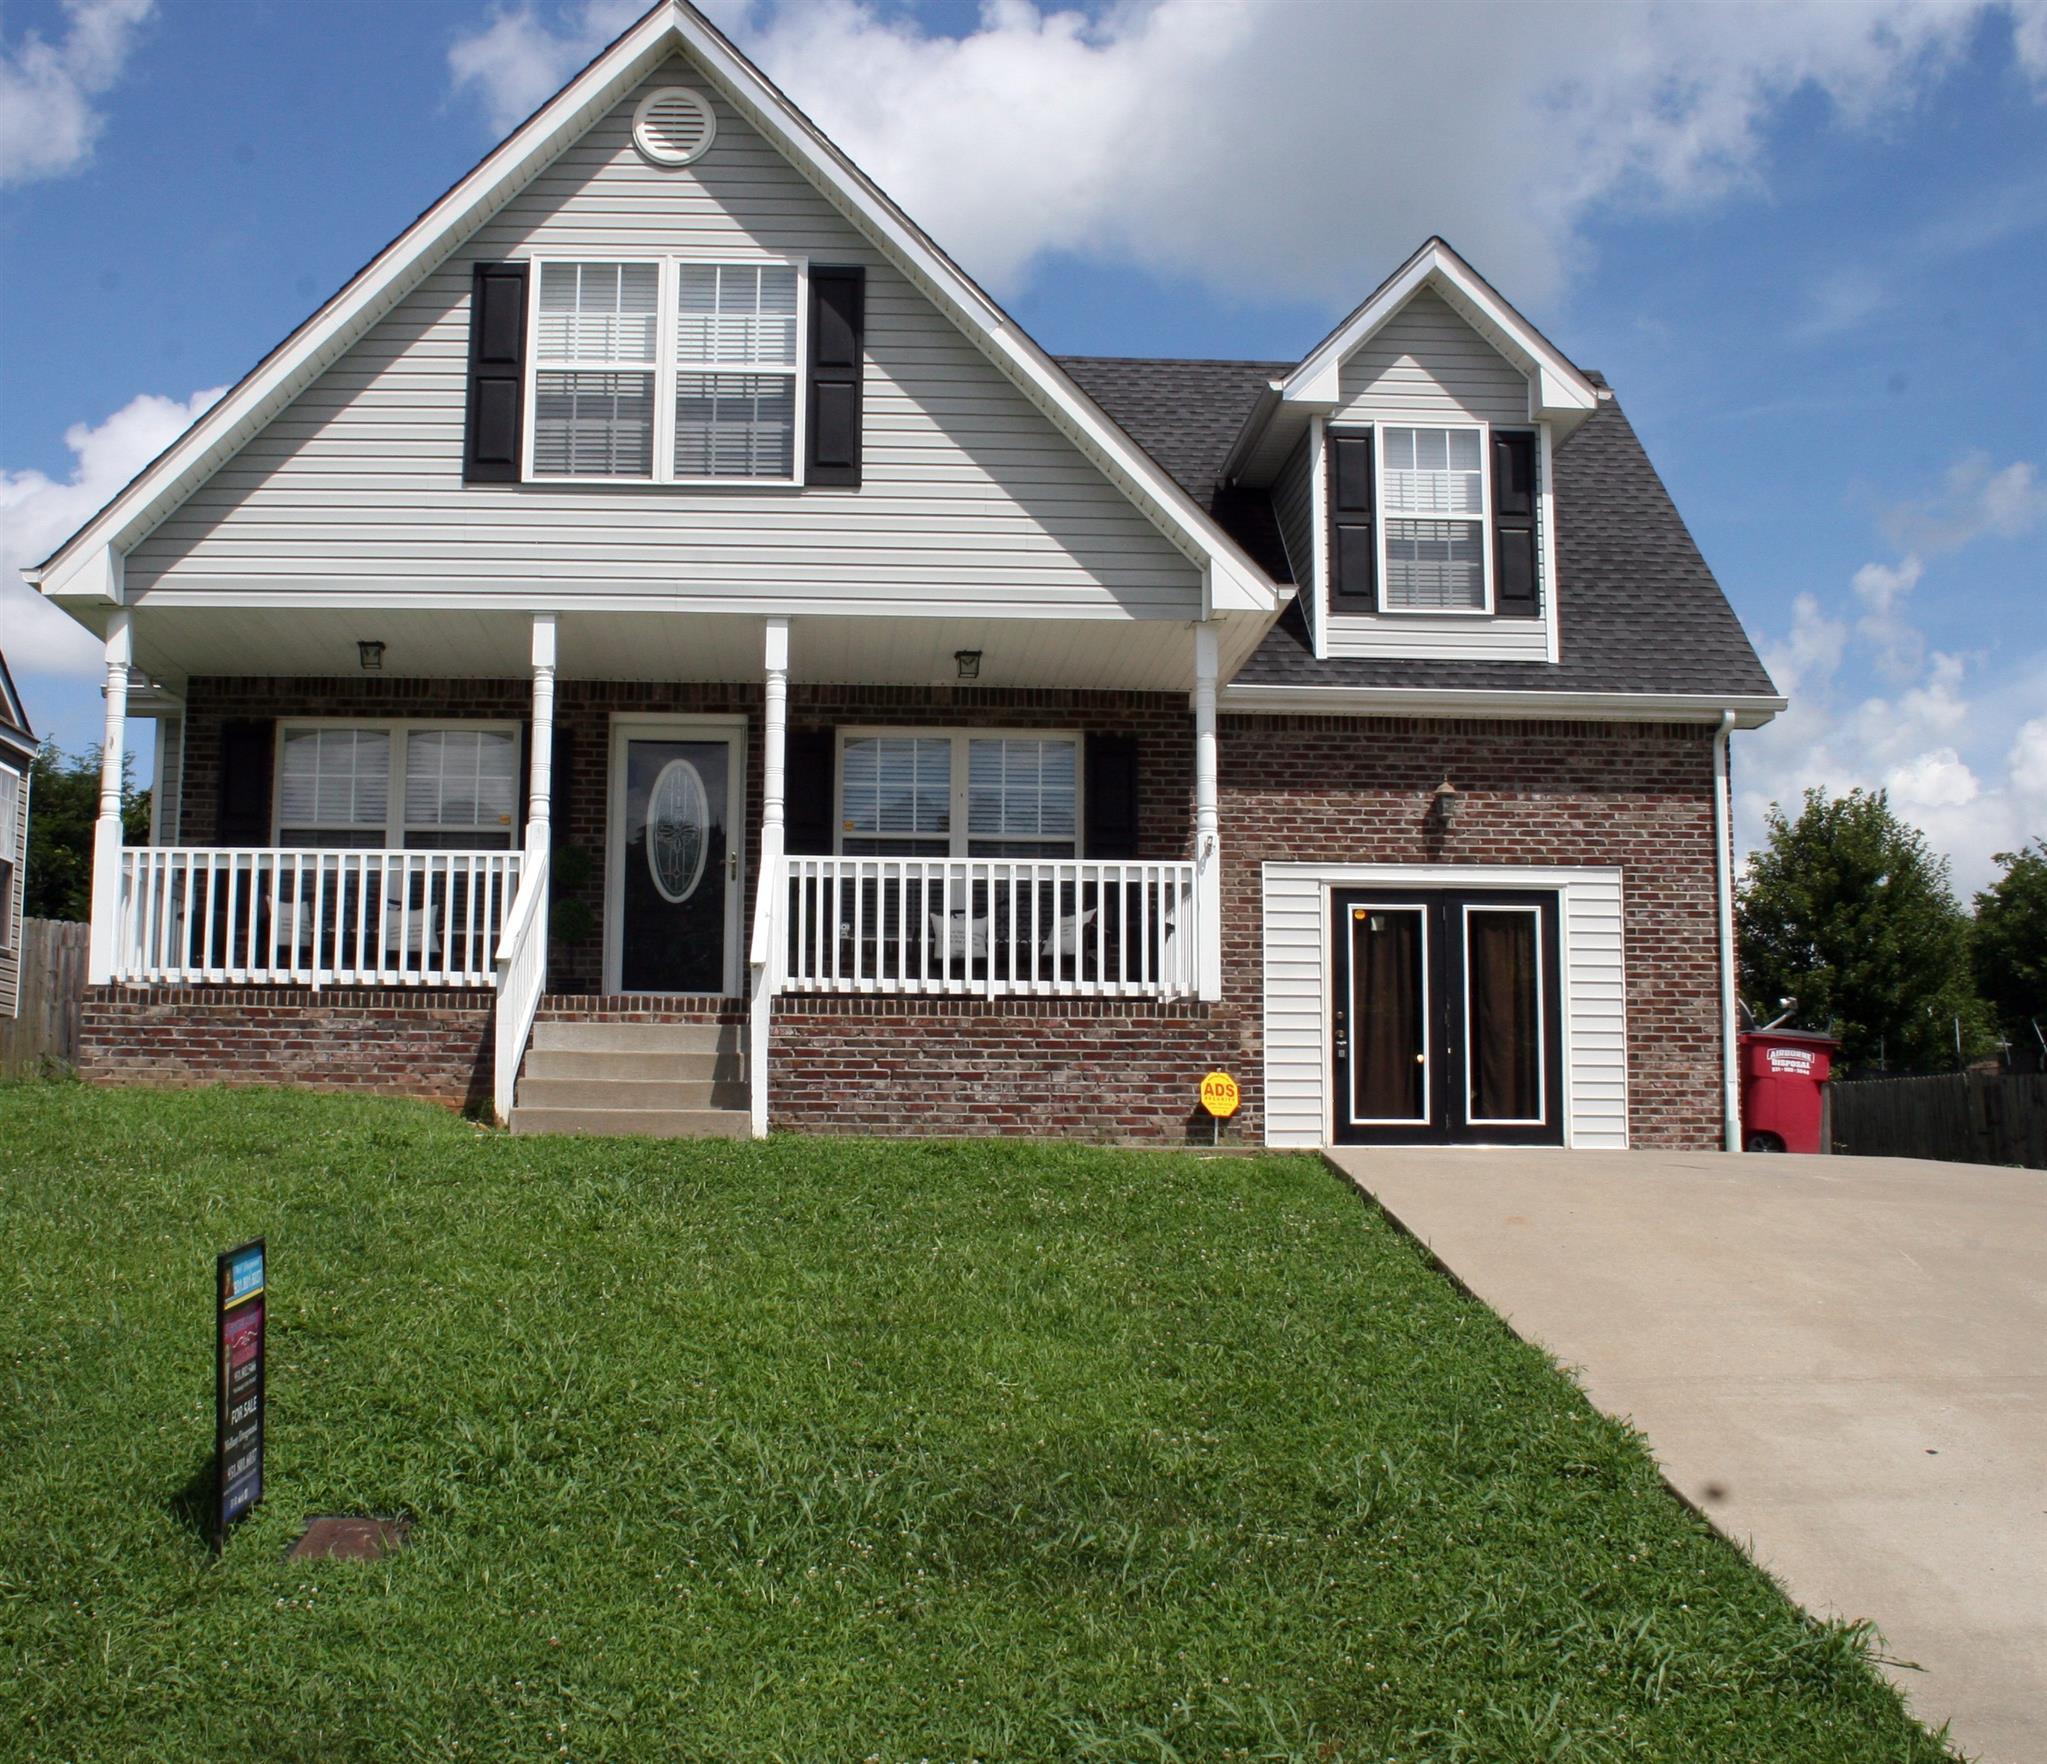 2649 Arthurs Ct, Clarksville, TN 37040 - Clarksville, TN real estate listing